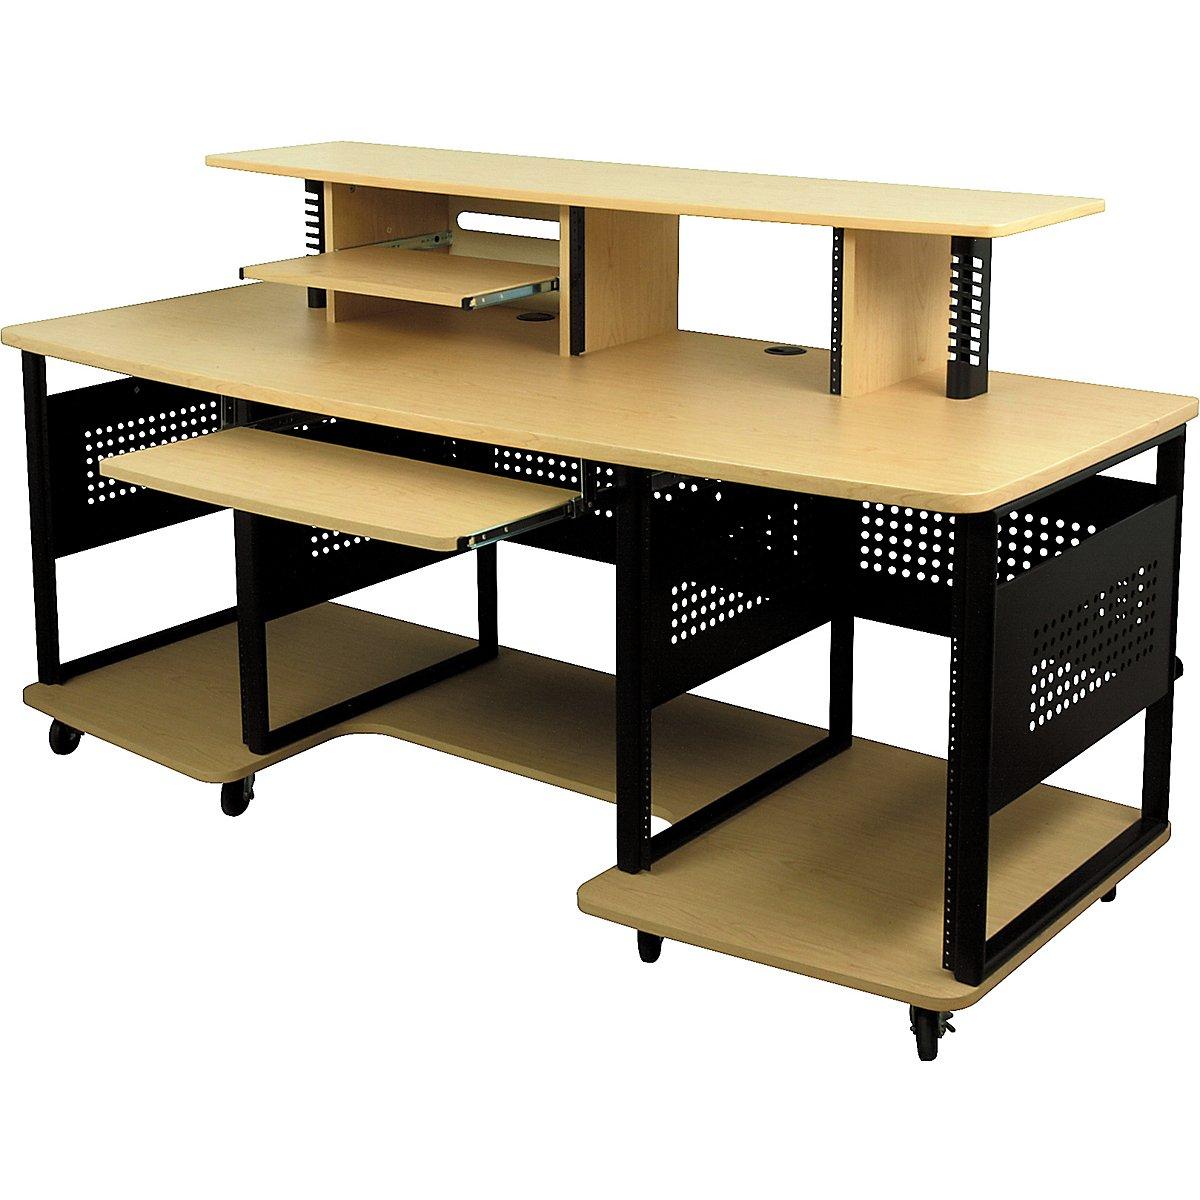 Studio Rta Creation Station Studio Desk Studio Rta Producer Station